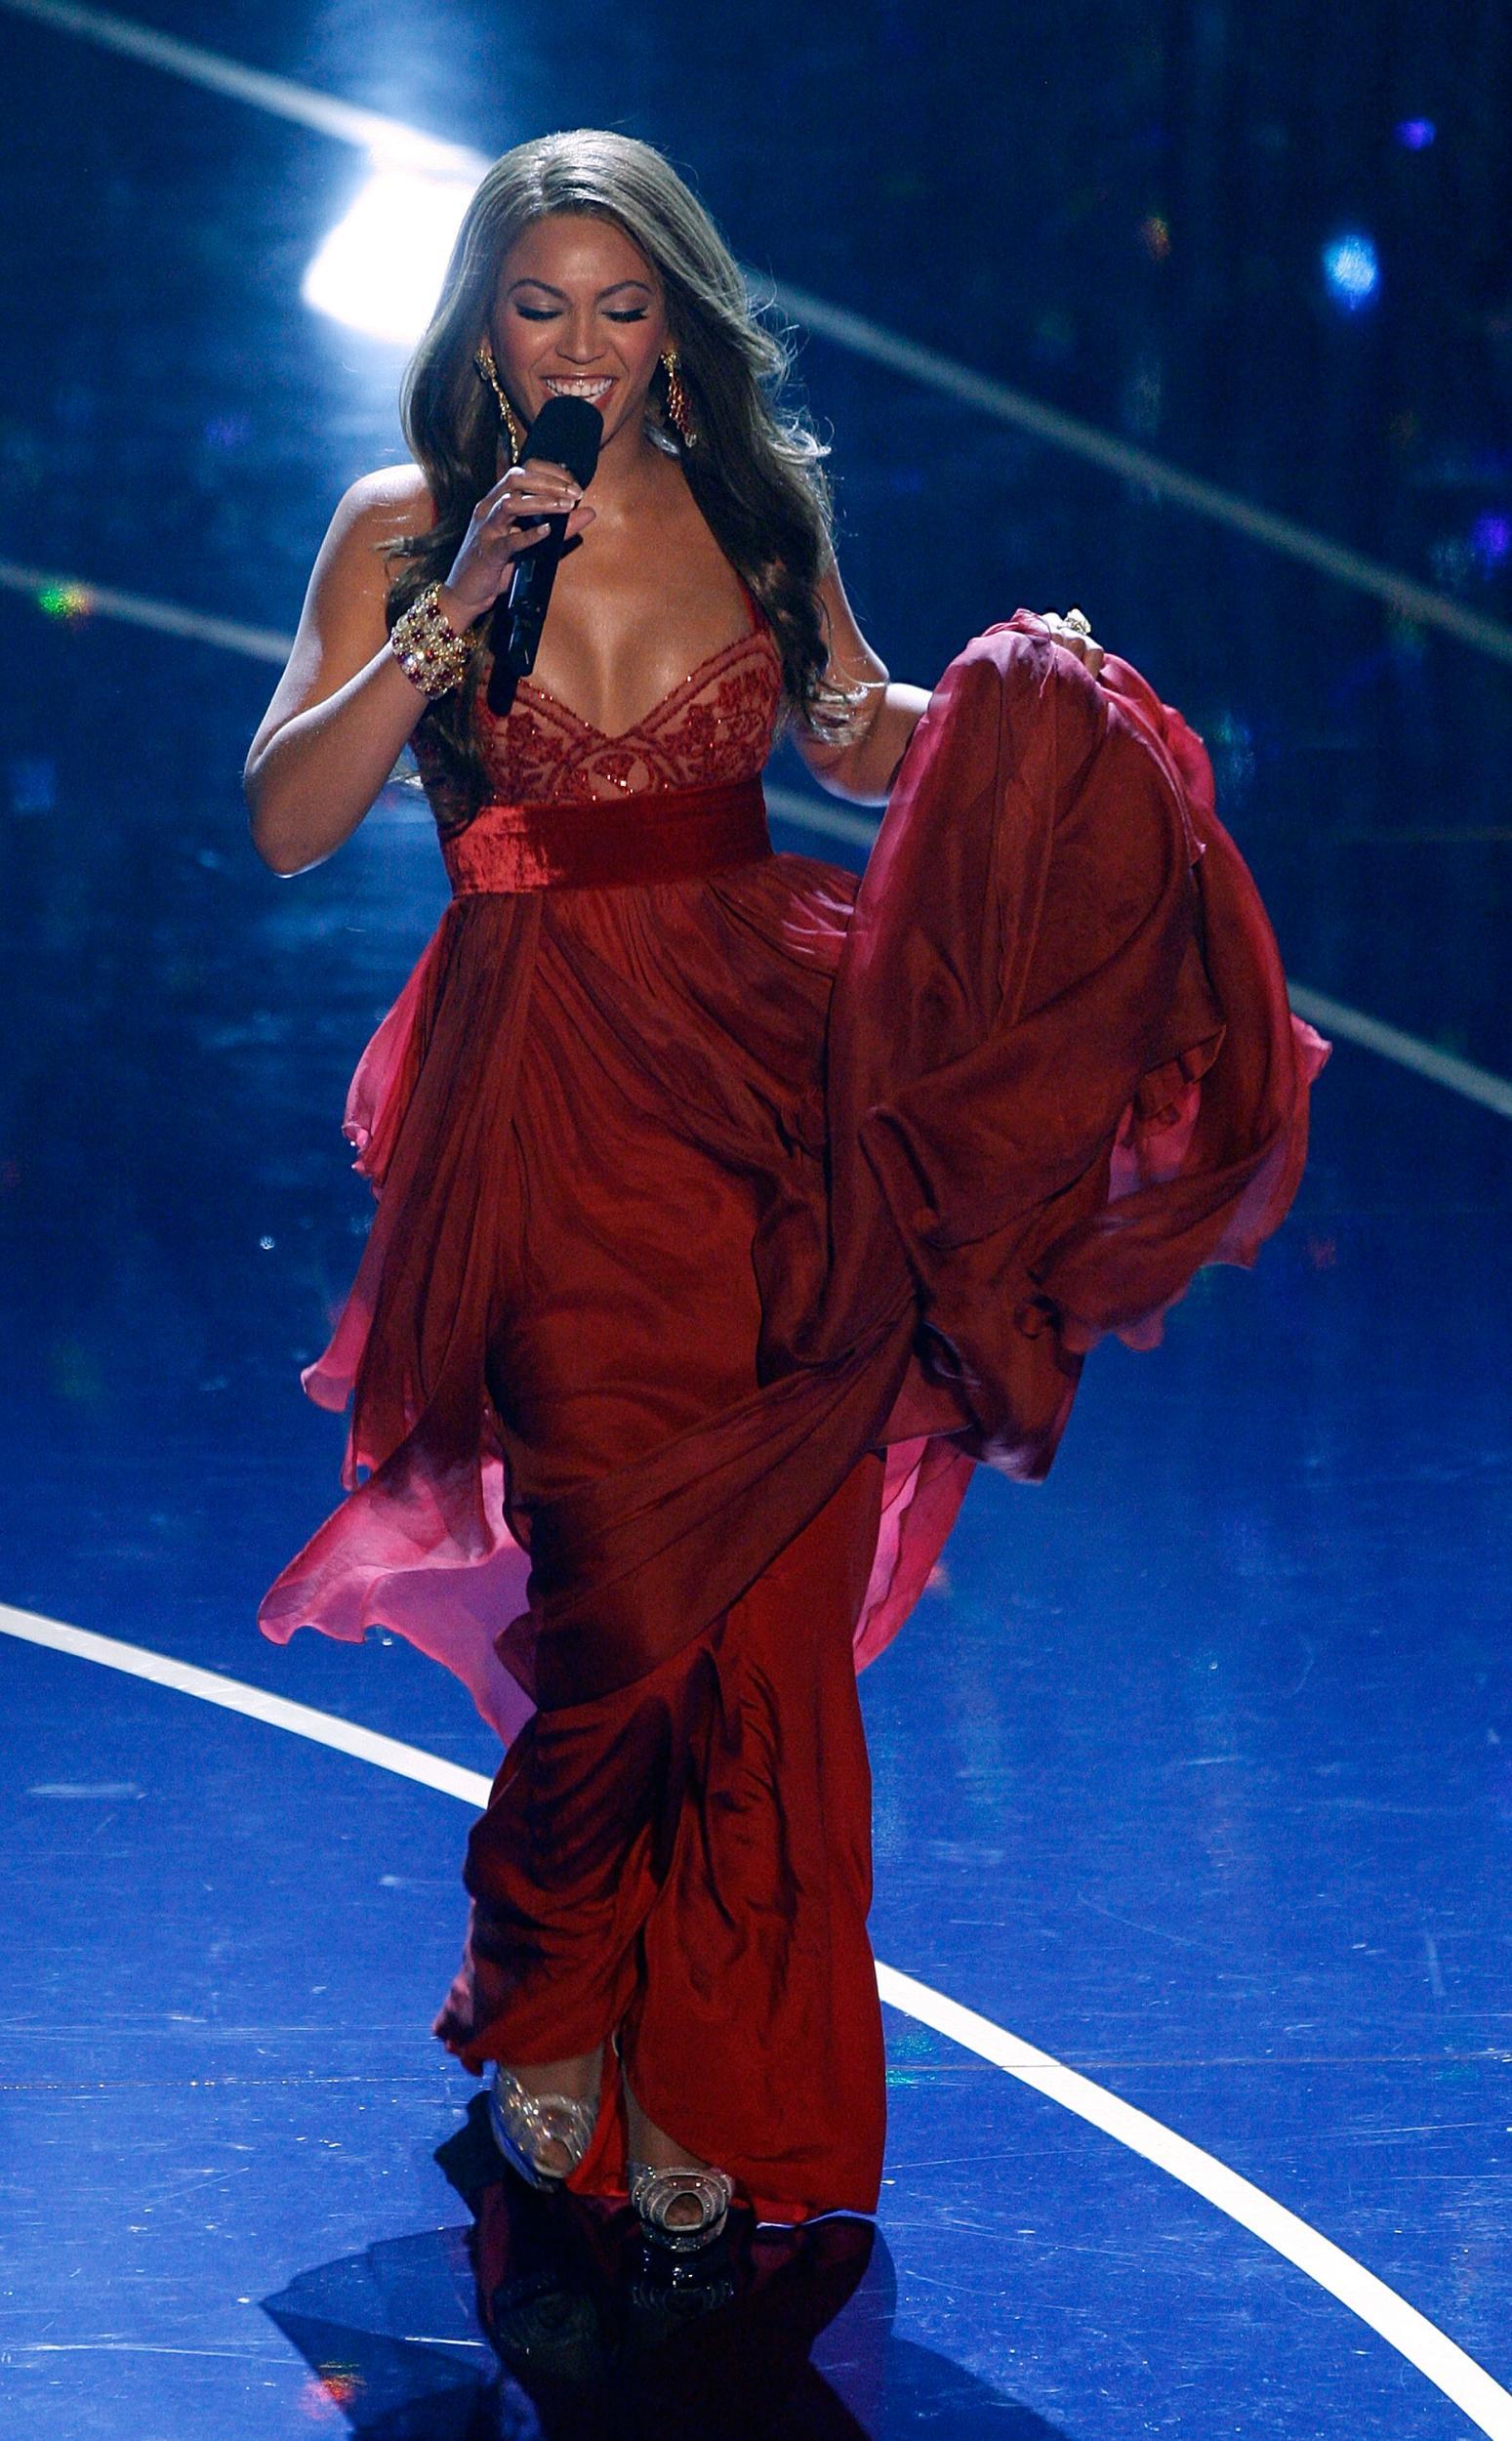 79th Academy Awards, February 2007